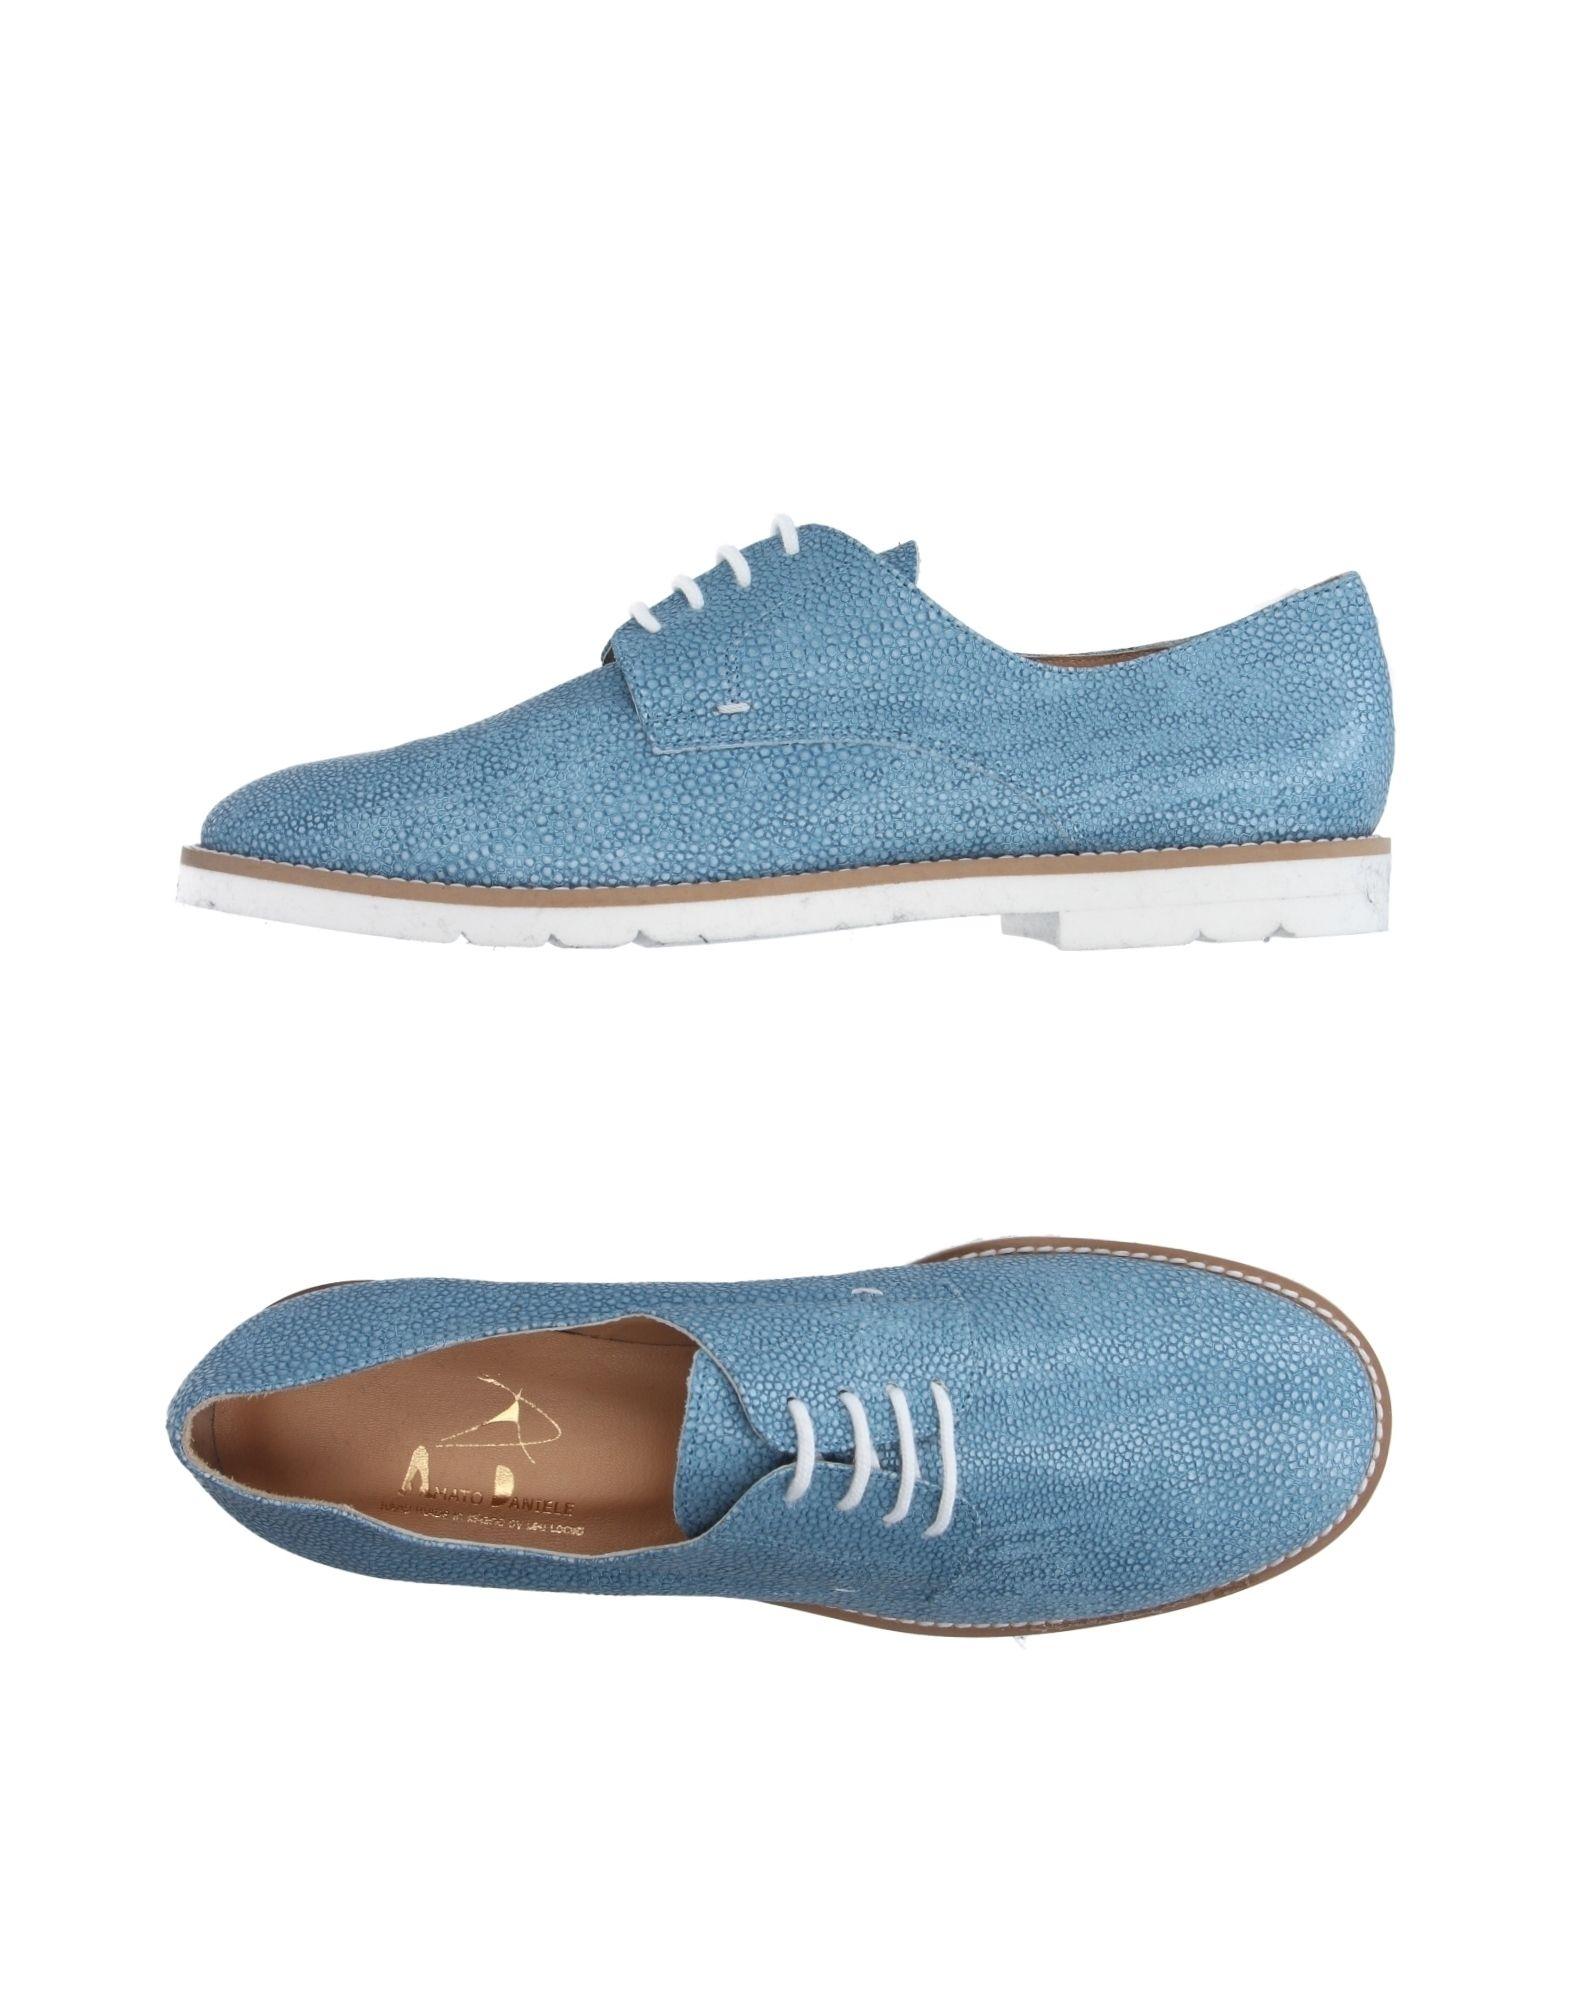 Recortes de precios estacionales, beneficios de descuento Zapato Zapato descuento De Cordones Amato Daniele Mujer - Zapatos De Cordones Amato Daniele  Azul celeste e01248